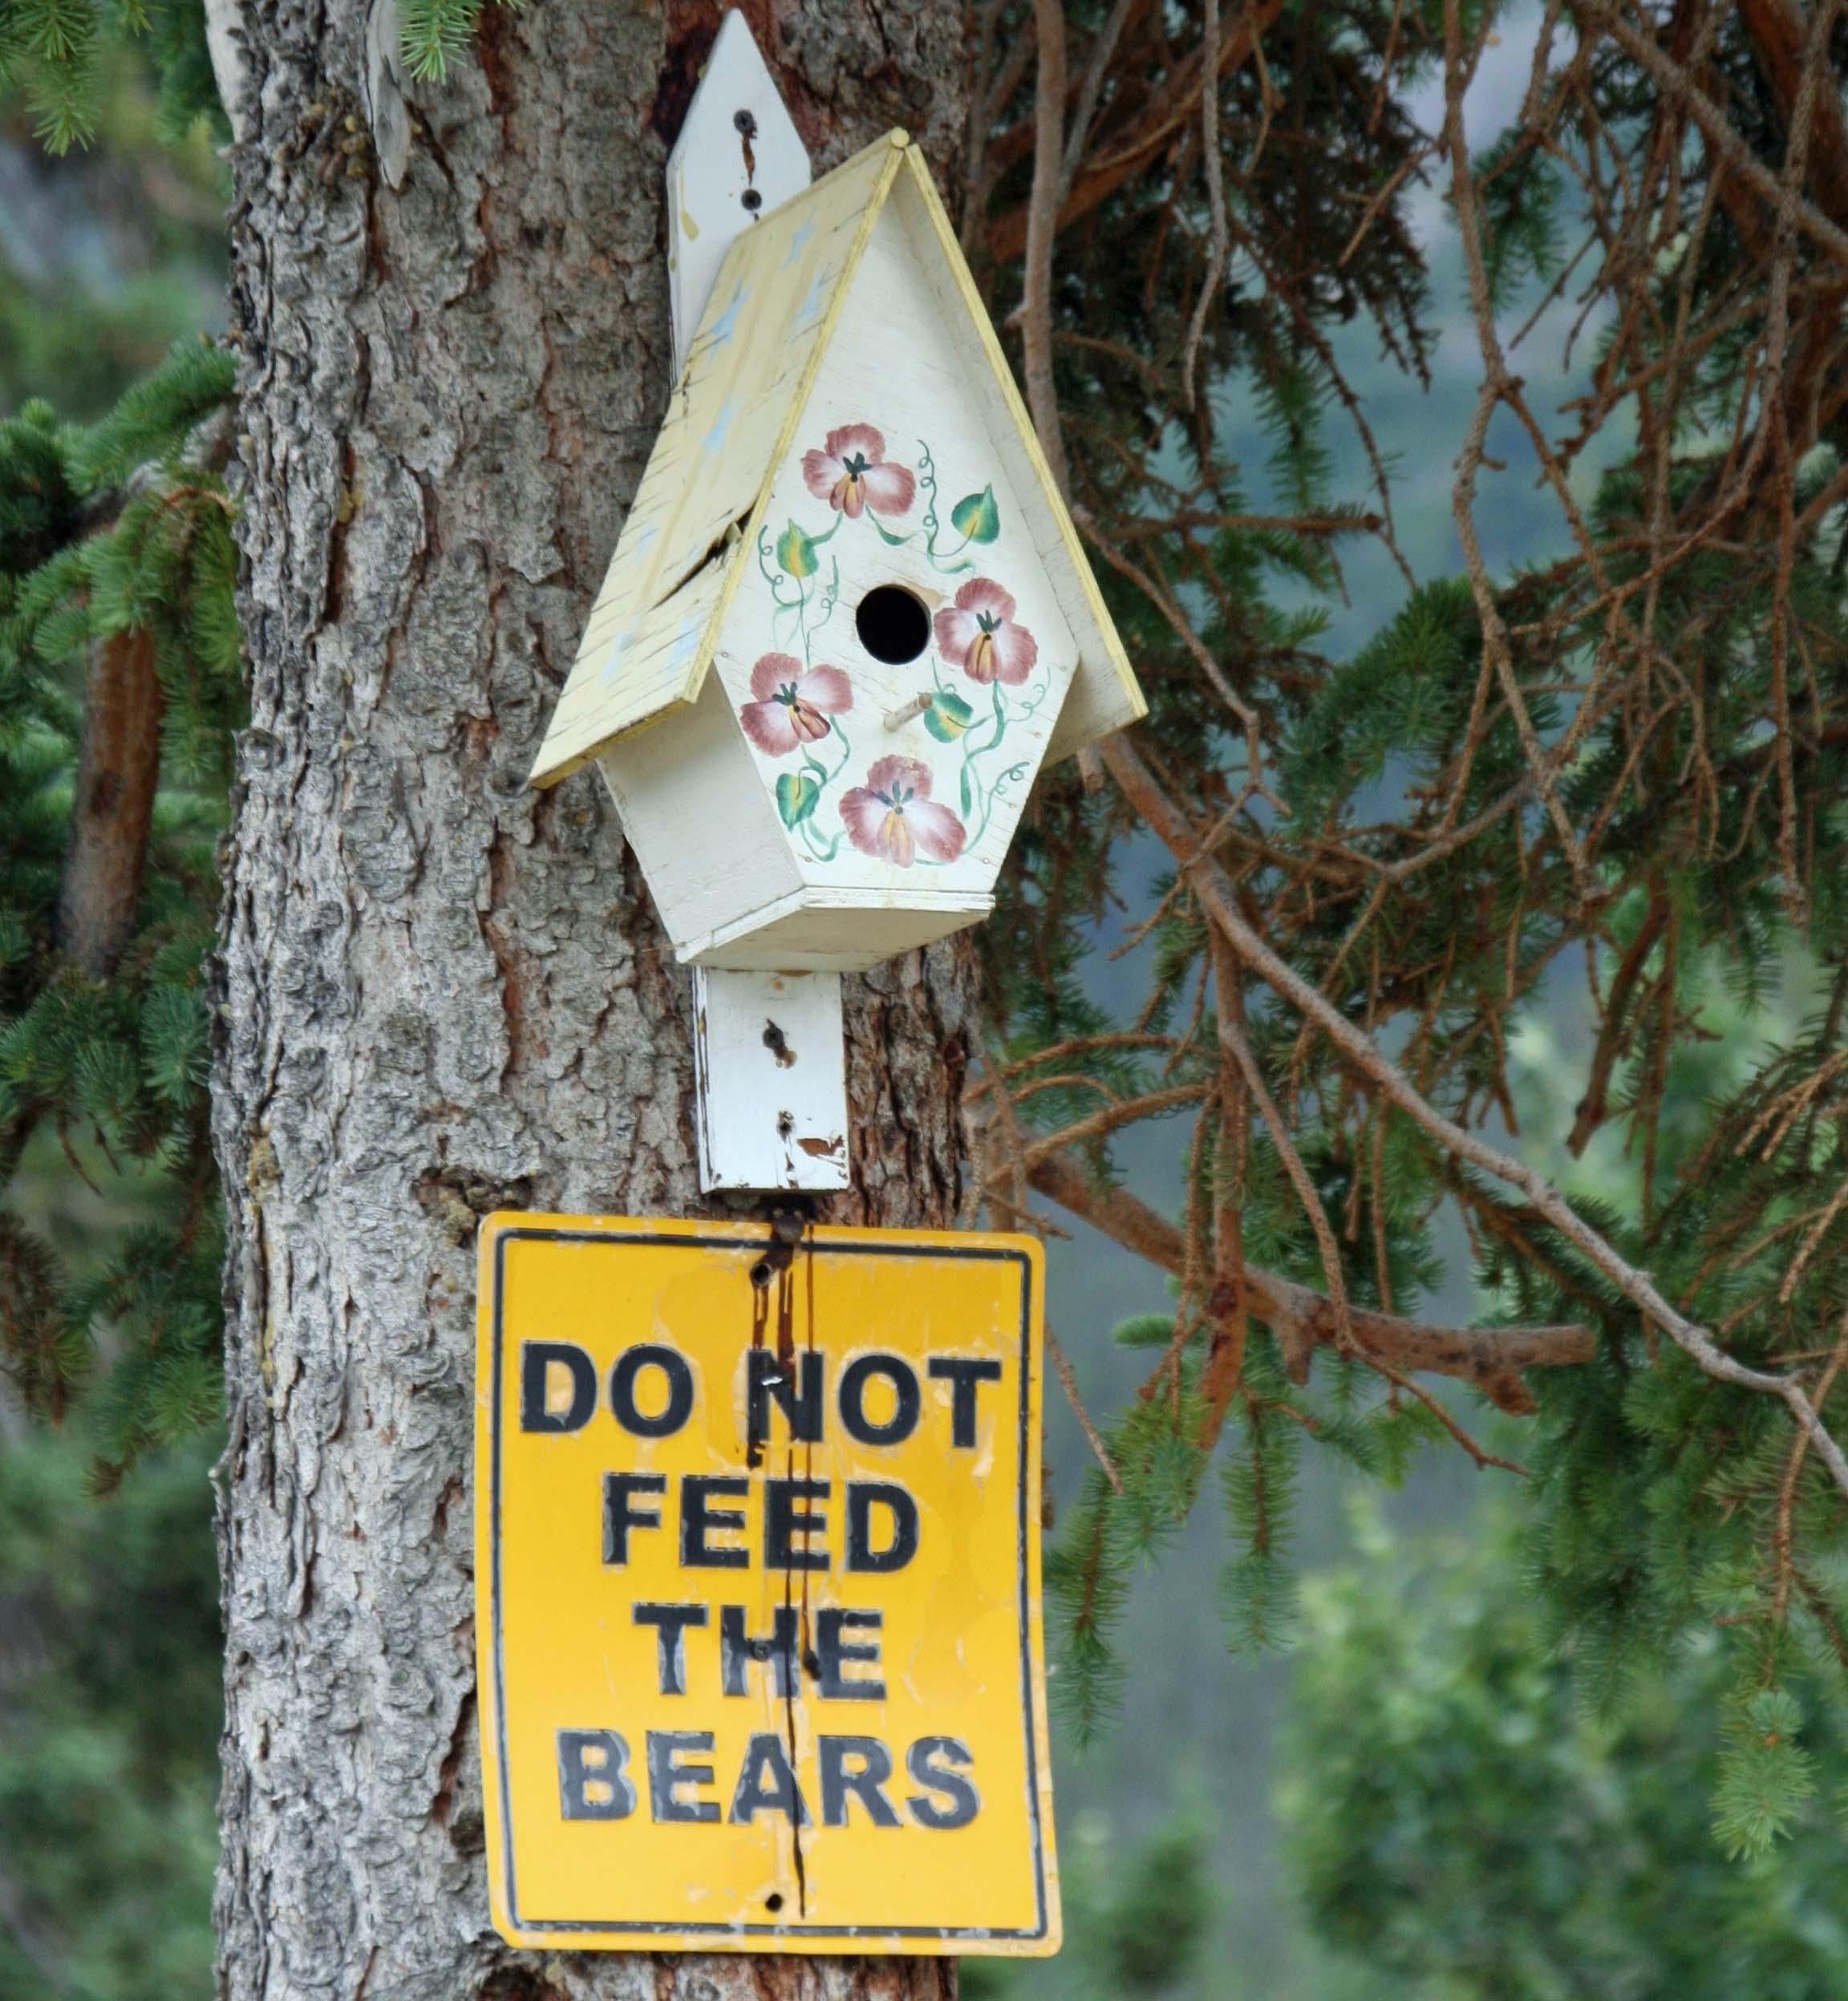 Do not feed bears, YT